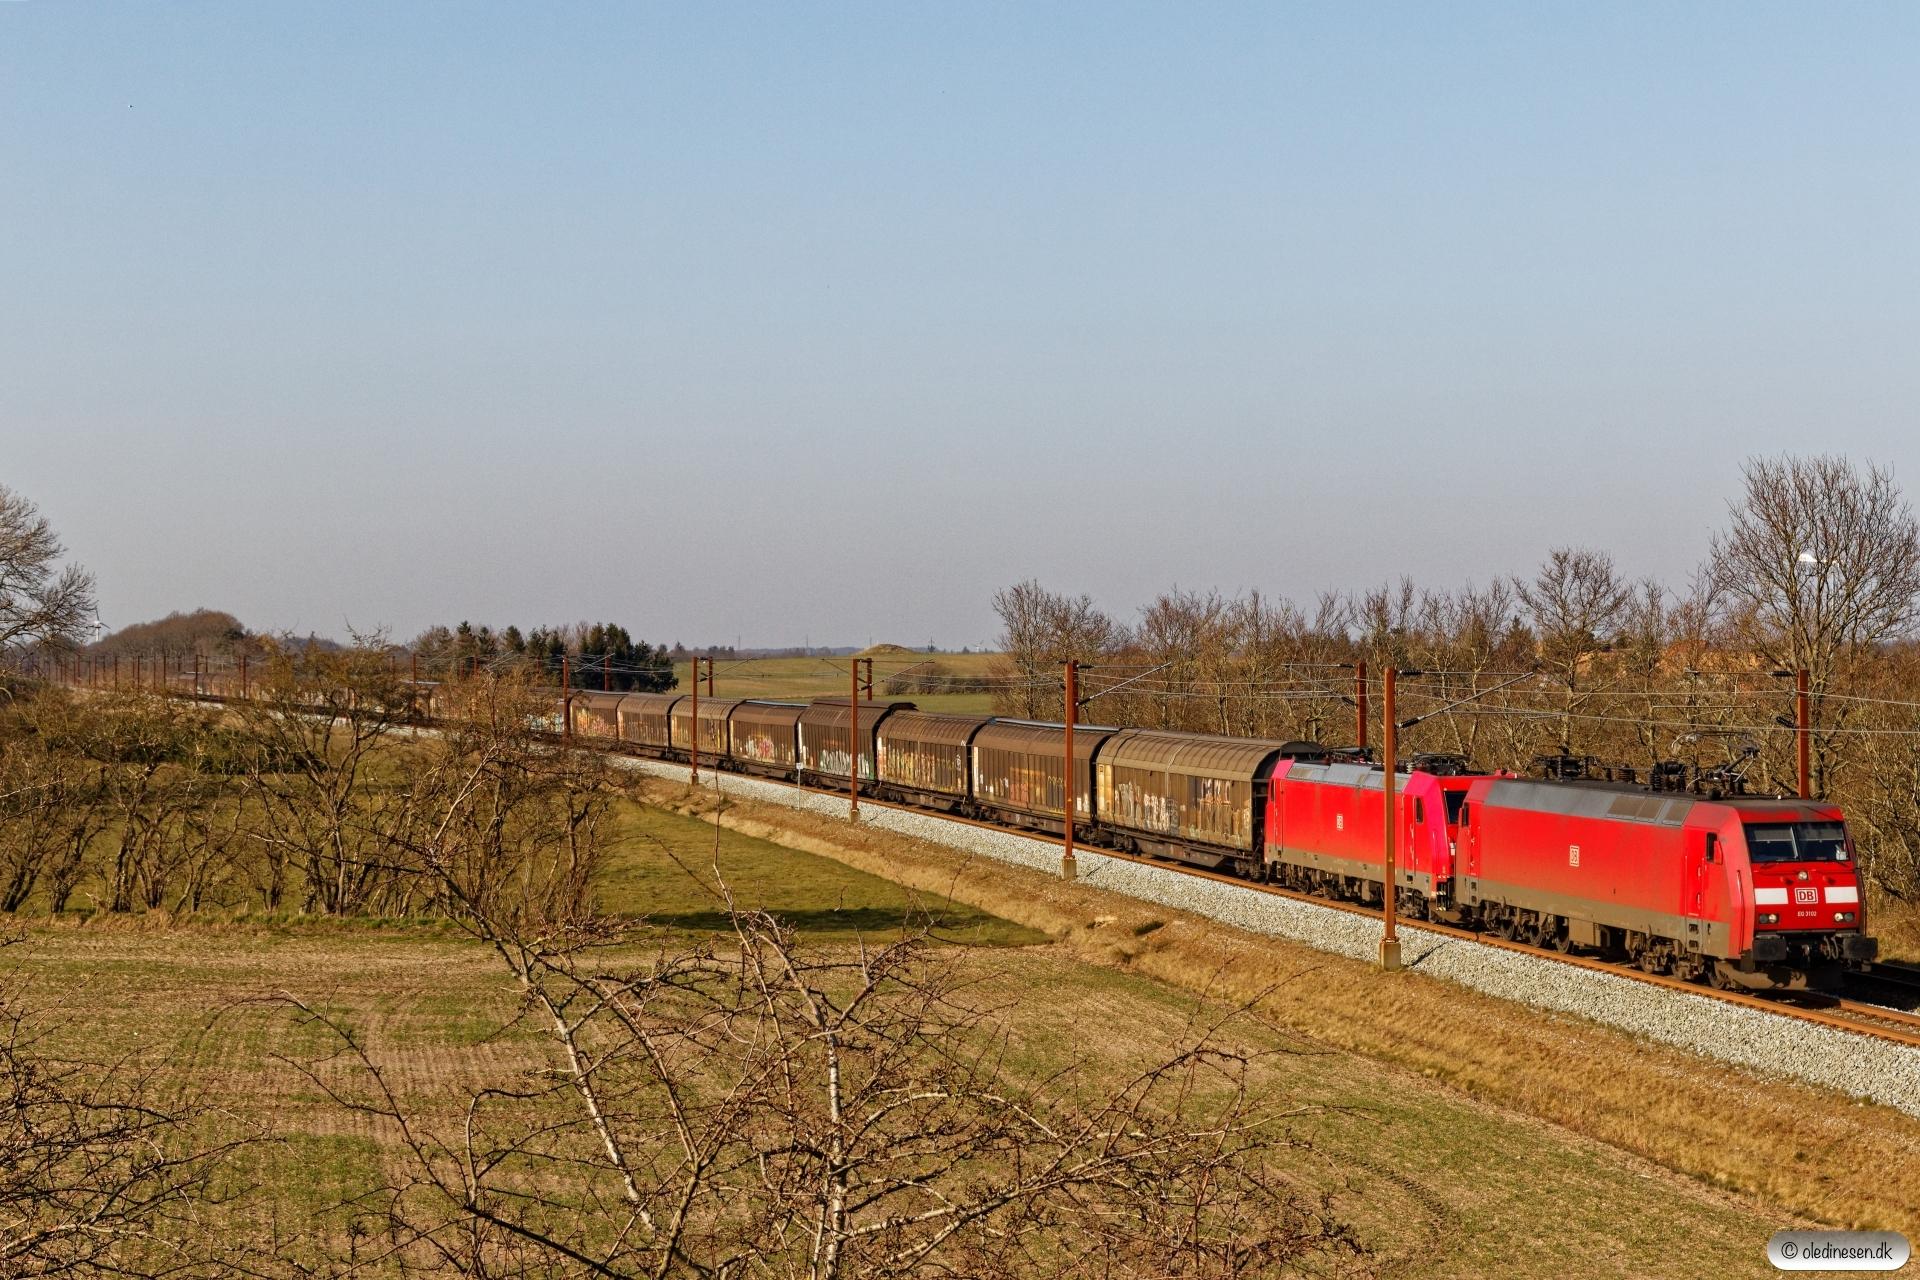 DBCSC EG 3102+DB 185 327-1 med GS 44729 Mgb-Pa. Km 54,4 Fa (Sommersted-Vojens) 05.04.2020.